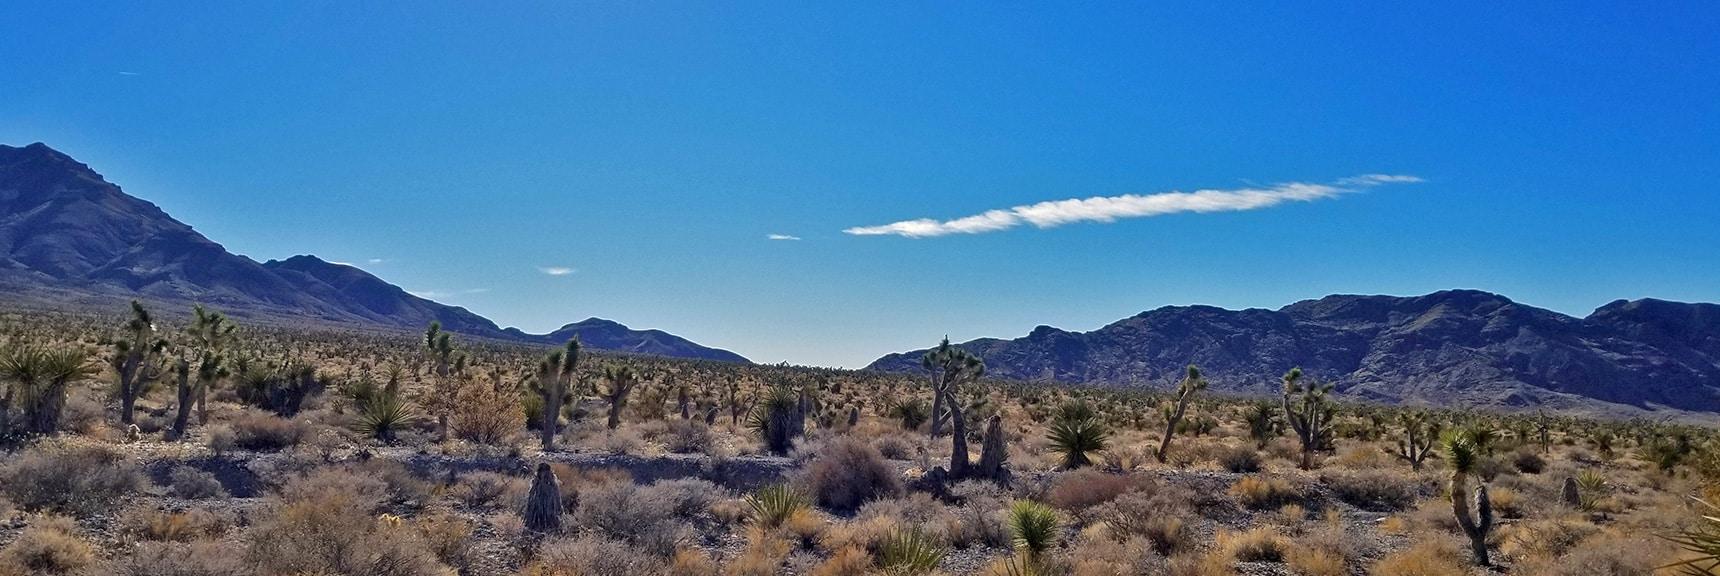 View Toward Eastern Pass of Gass Peak from Gass Peak Road | Gass Peak Road Circuit | Desert National Wildlife Refuge | Nevada